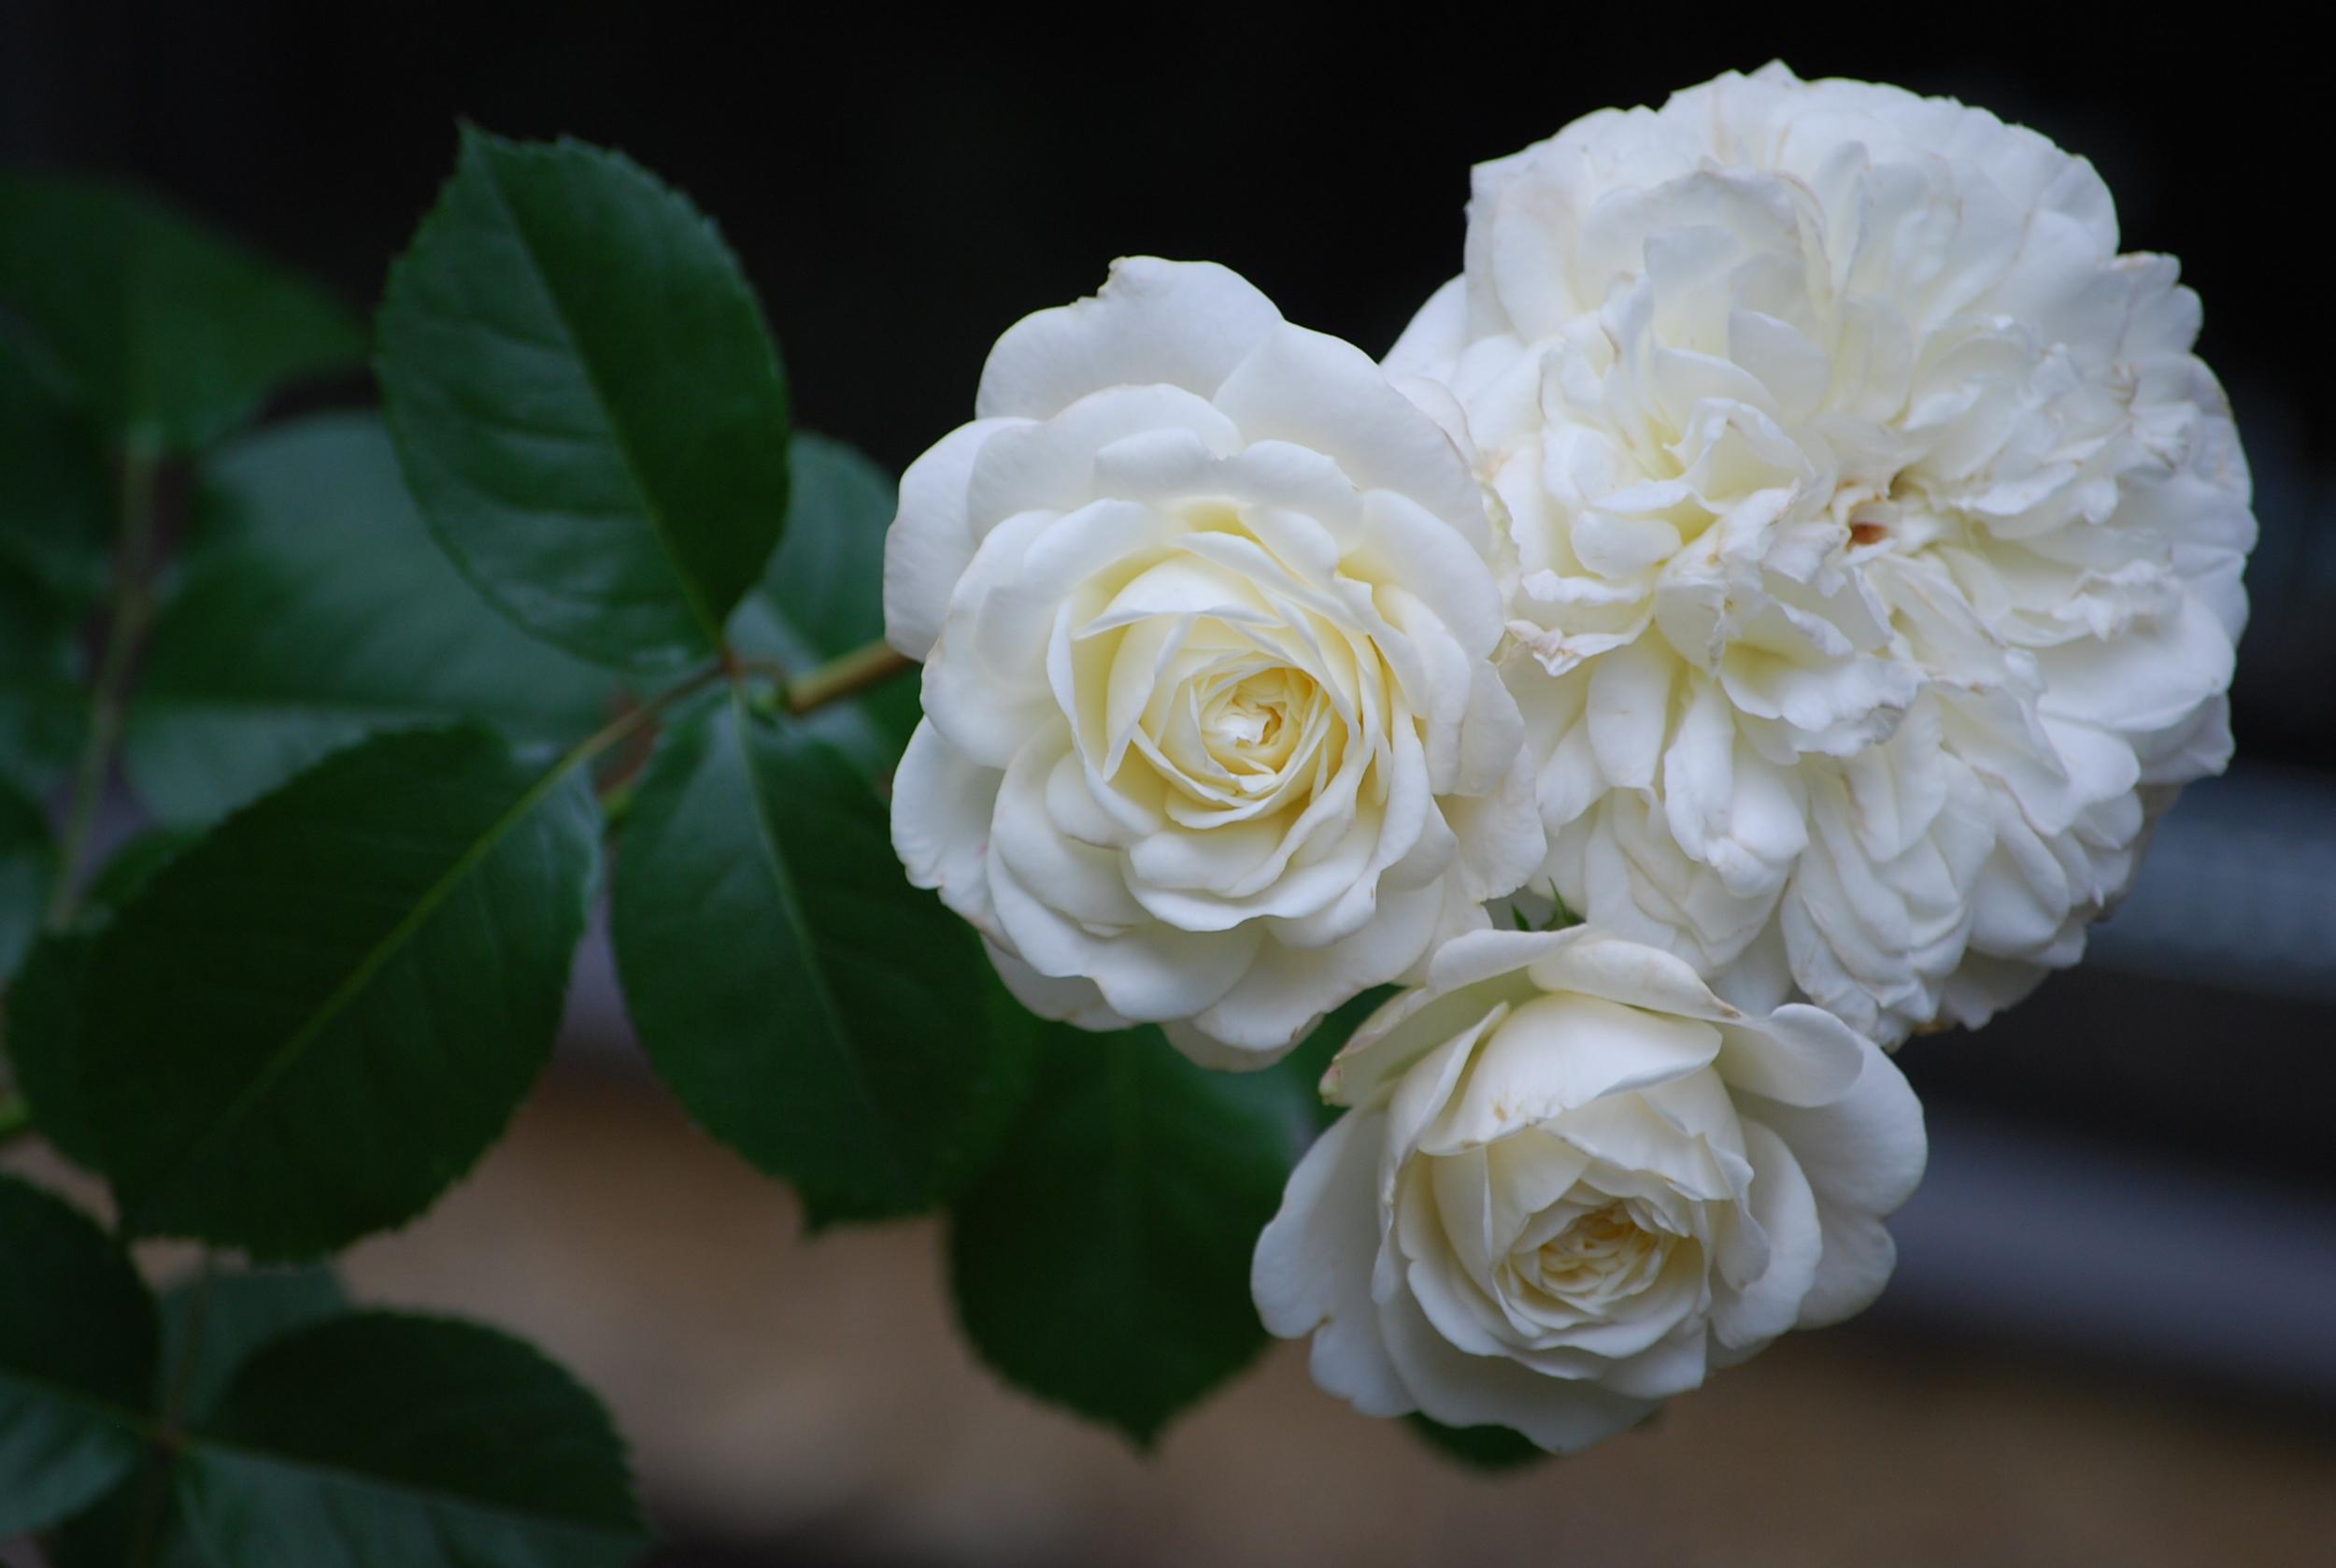 garden june 28,2014 004.JPG